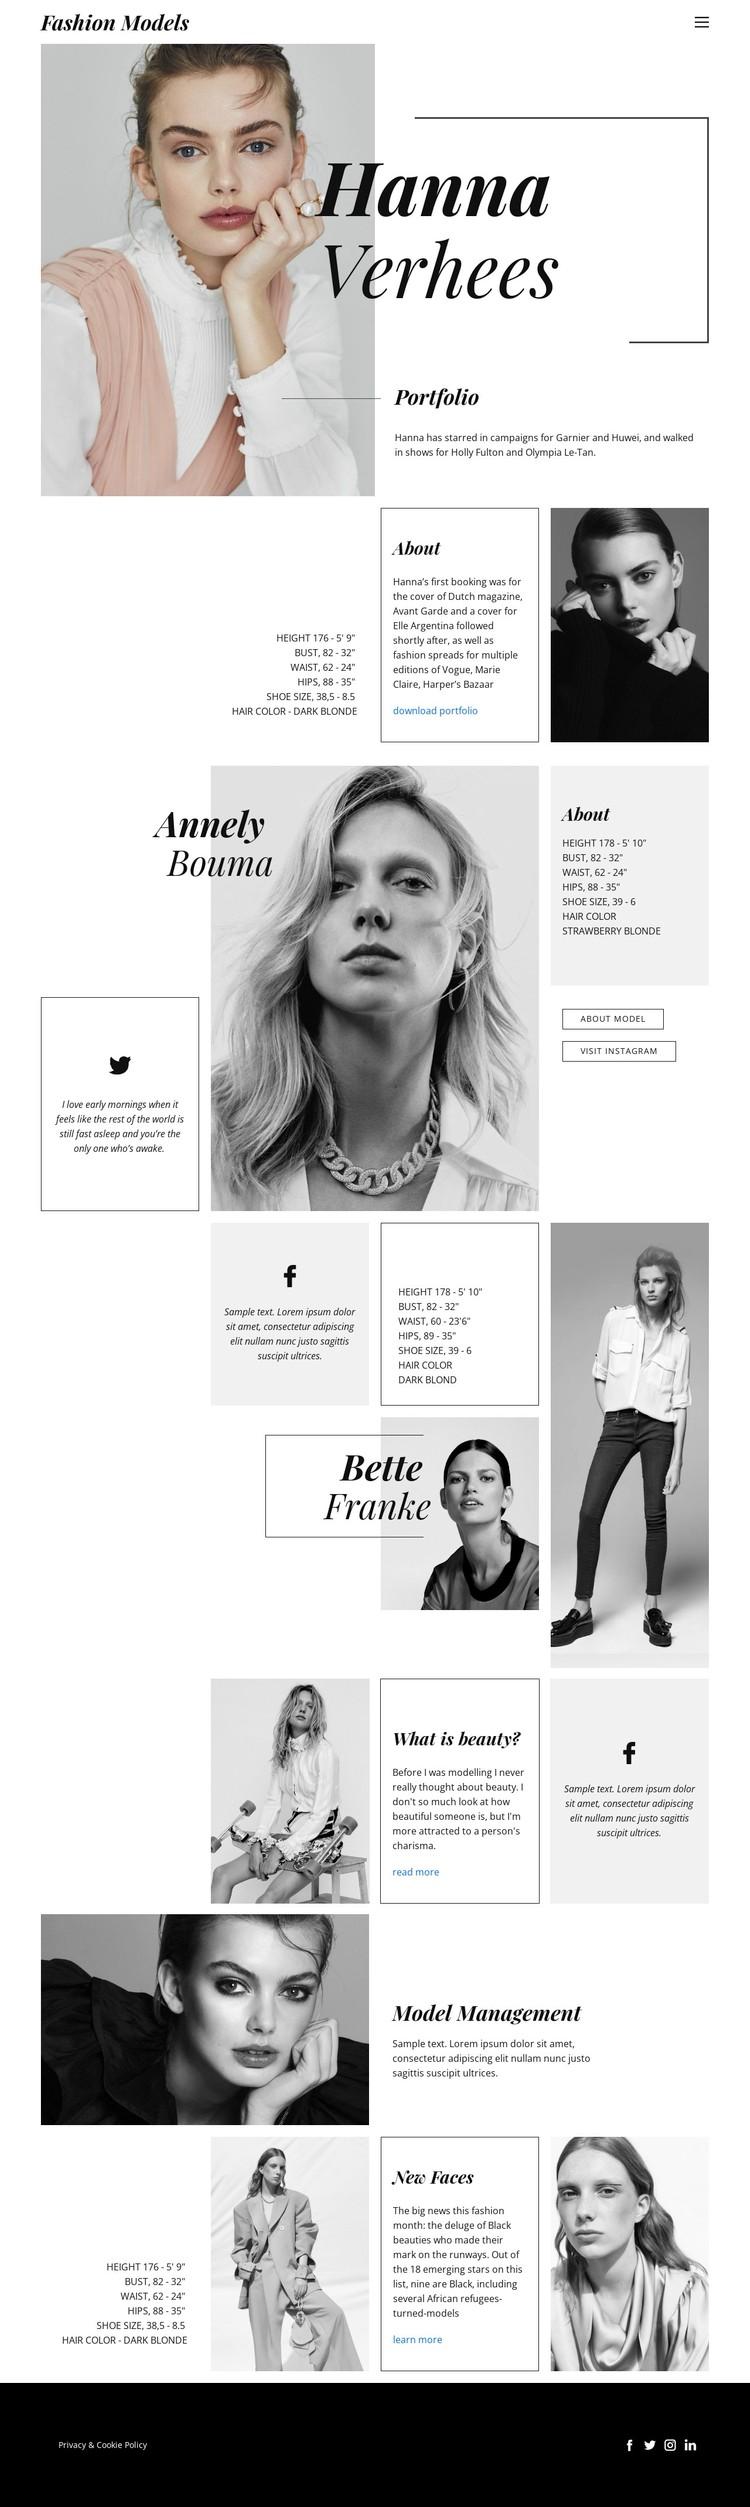 Hanna Verhees Blog WordPress Template